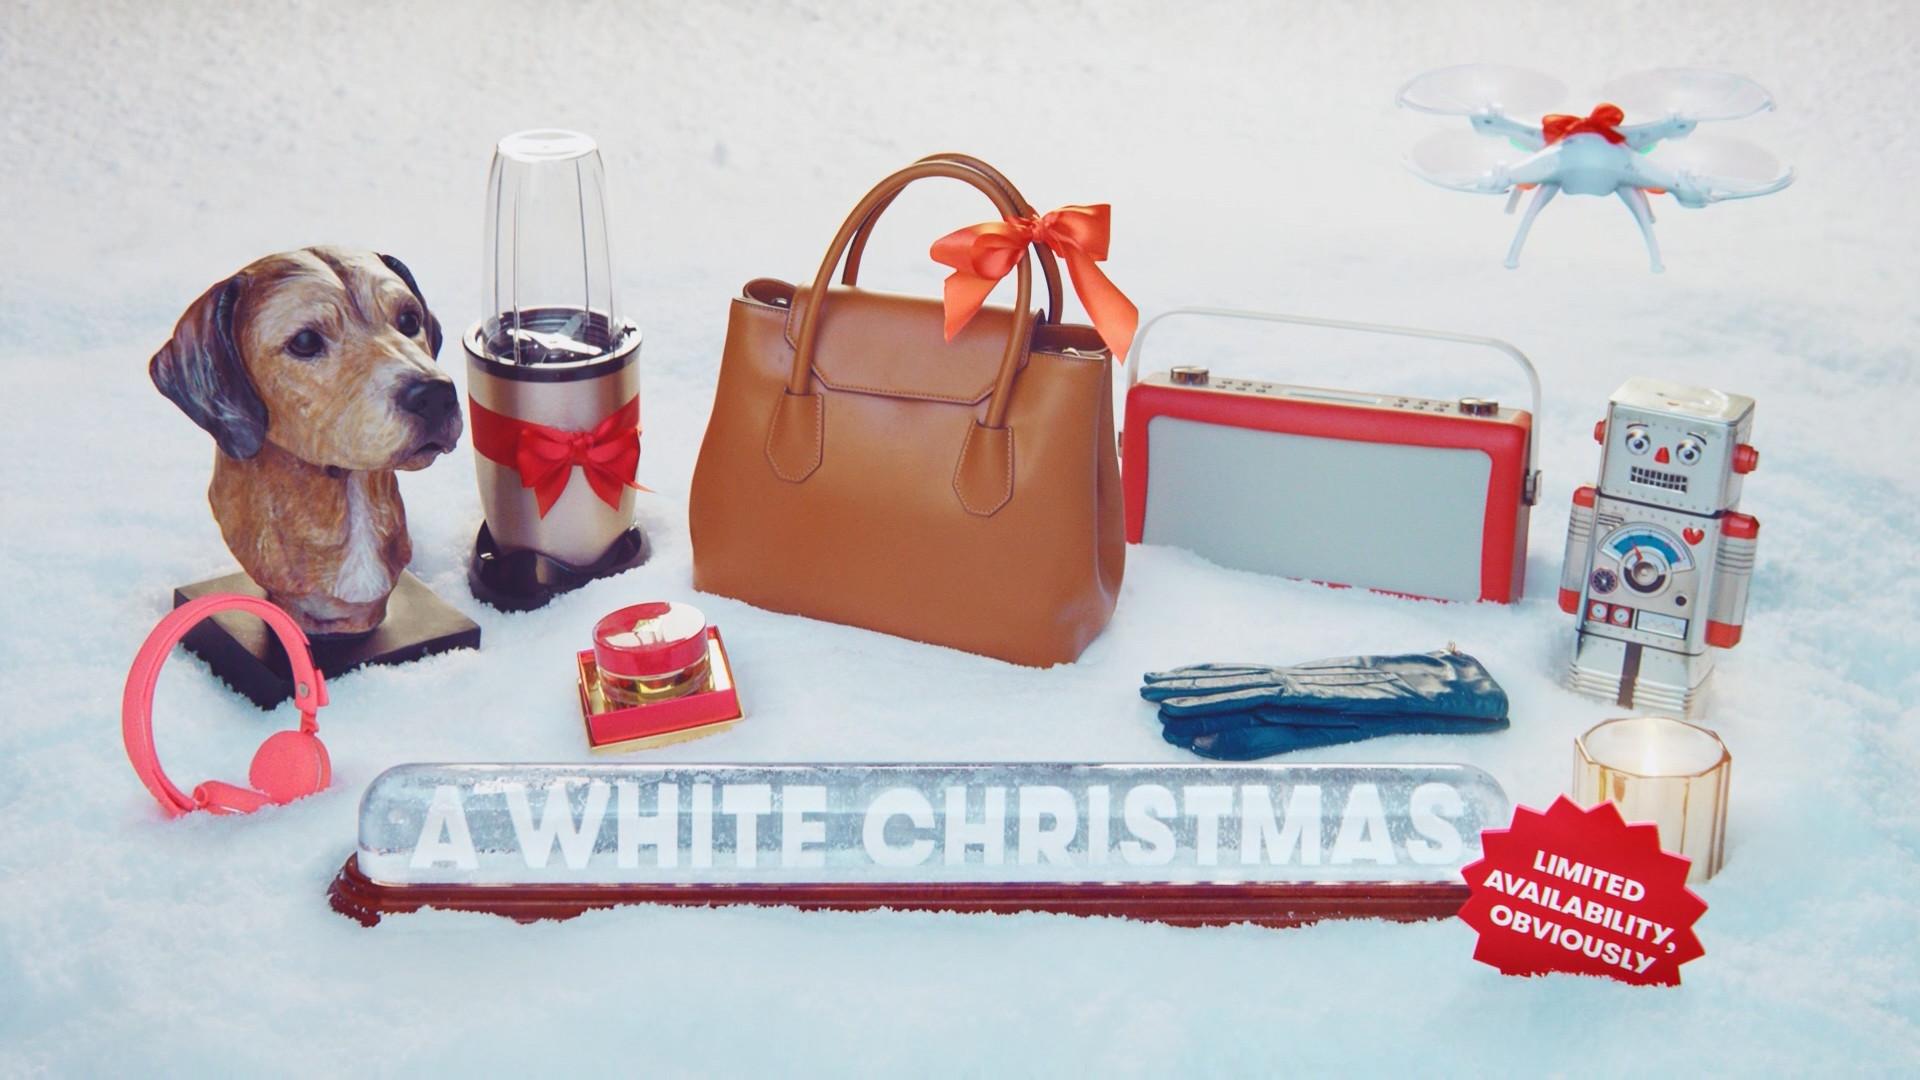 TK Maxx - White Christmas_1-0053